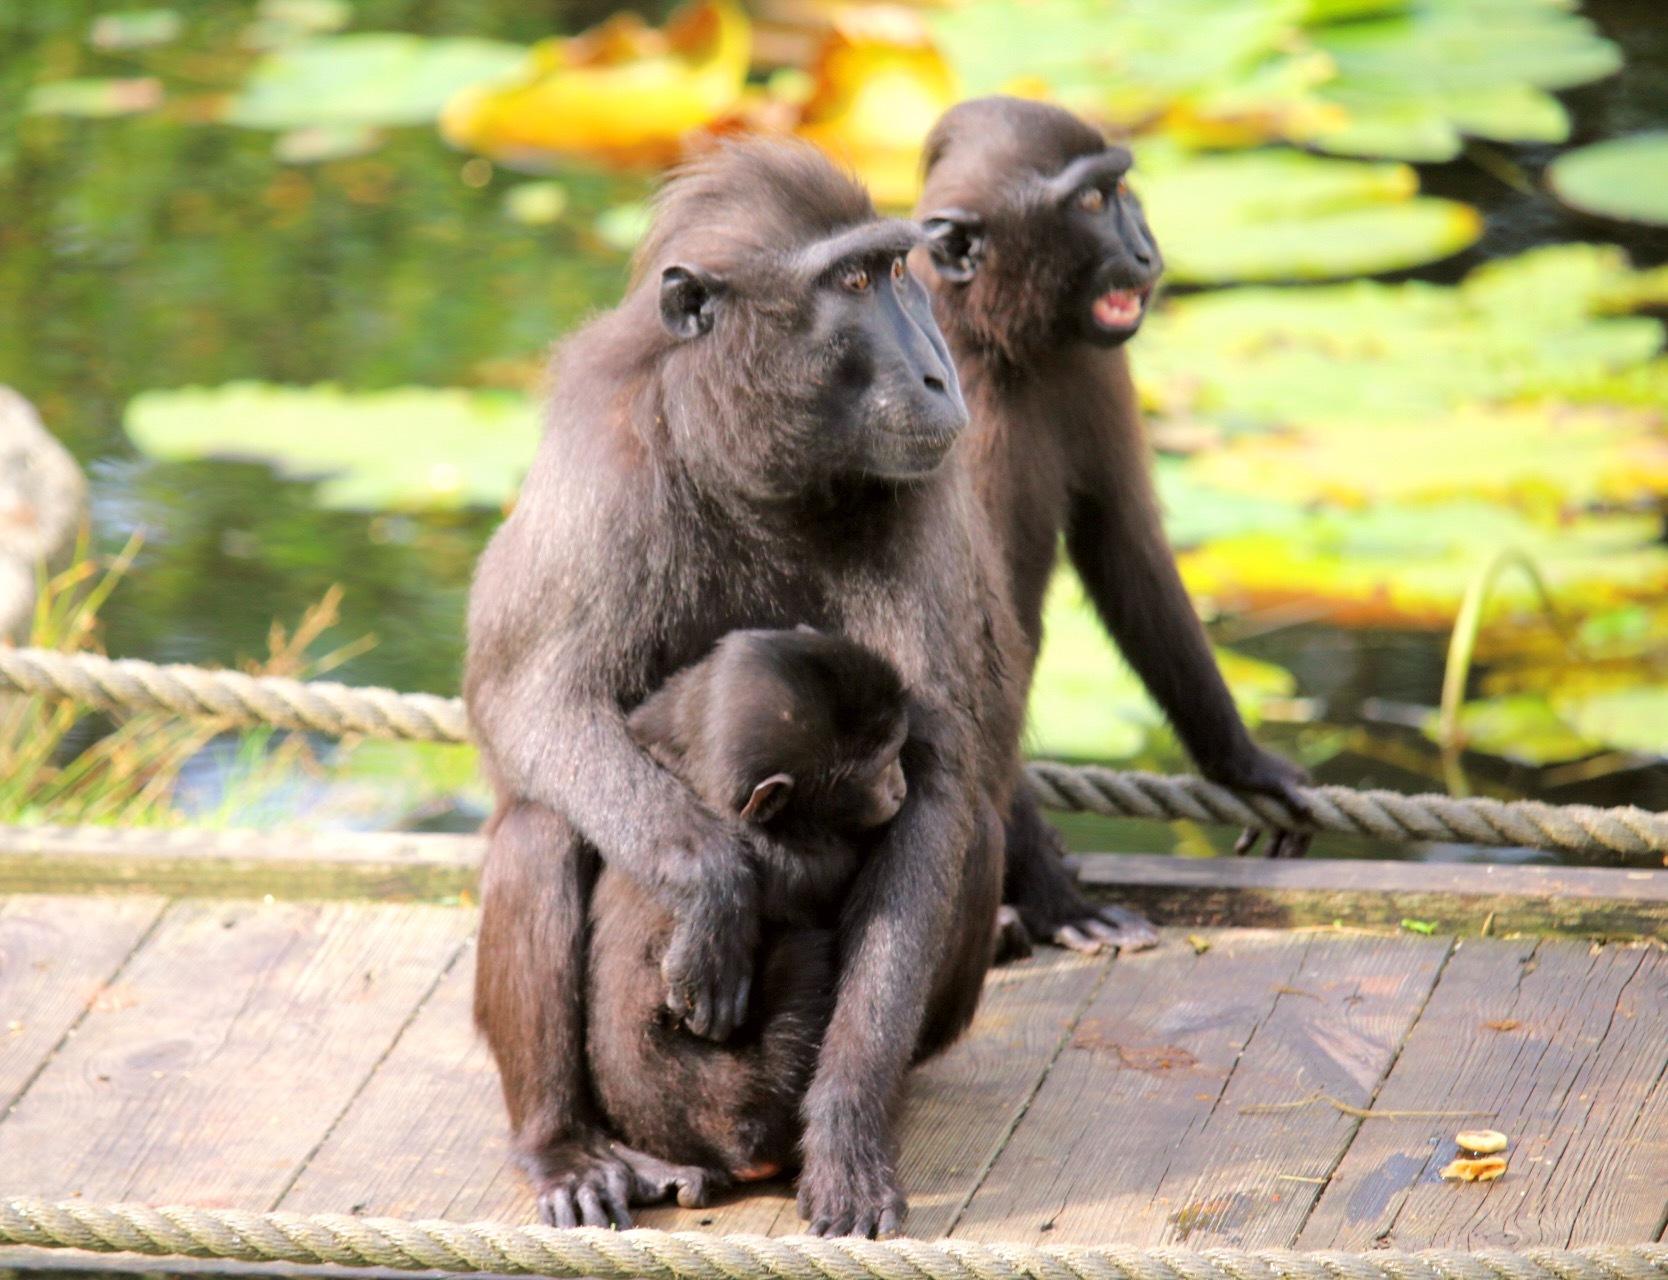 Monkeys by Ingstina